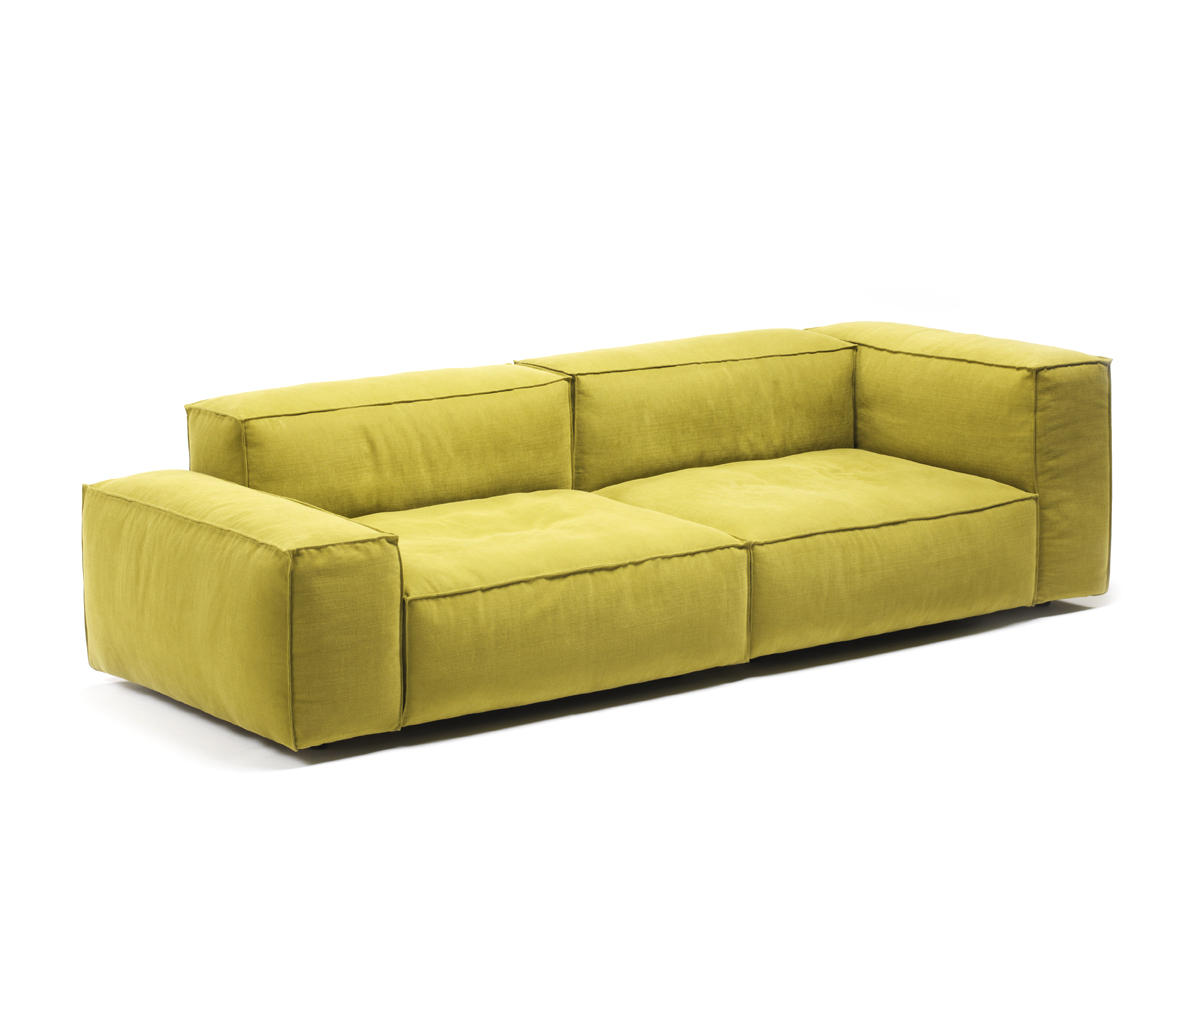 divani sofa divani sofa 76 with chinaklsk thesofa. Black Bedroom Furniture Sets. Home Design Ideas